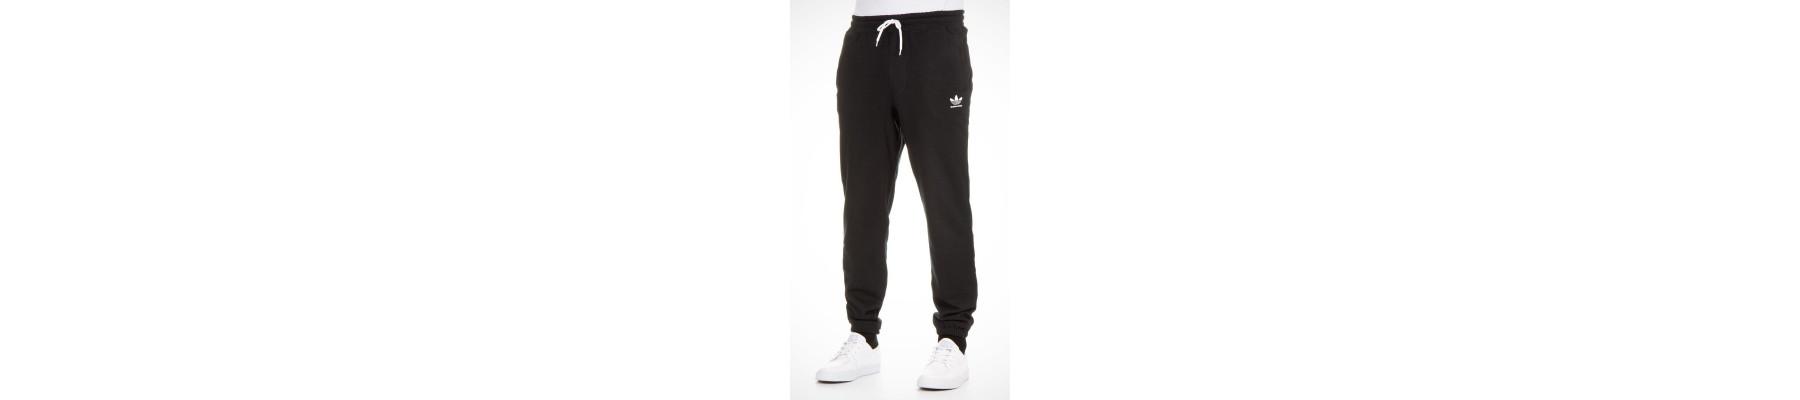 Adidas Skateboarding ADV Sweatpants Black